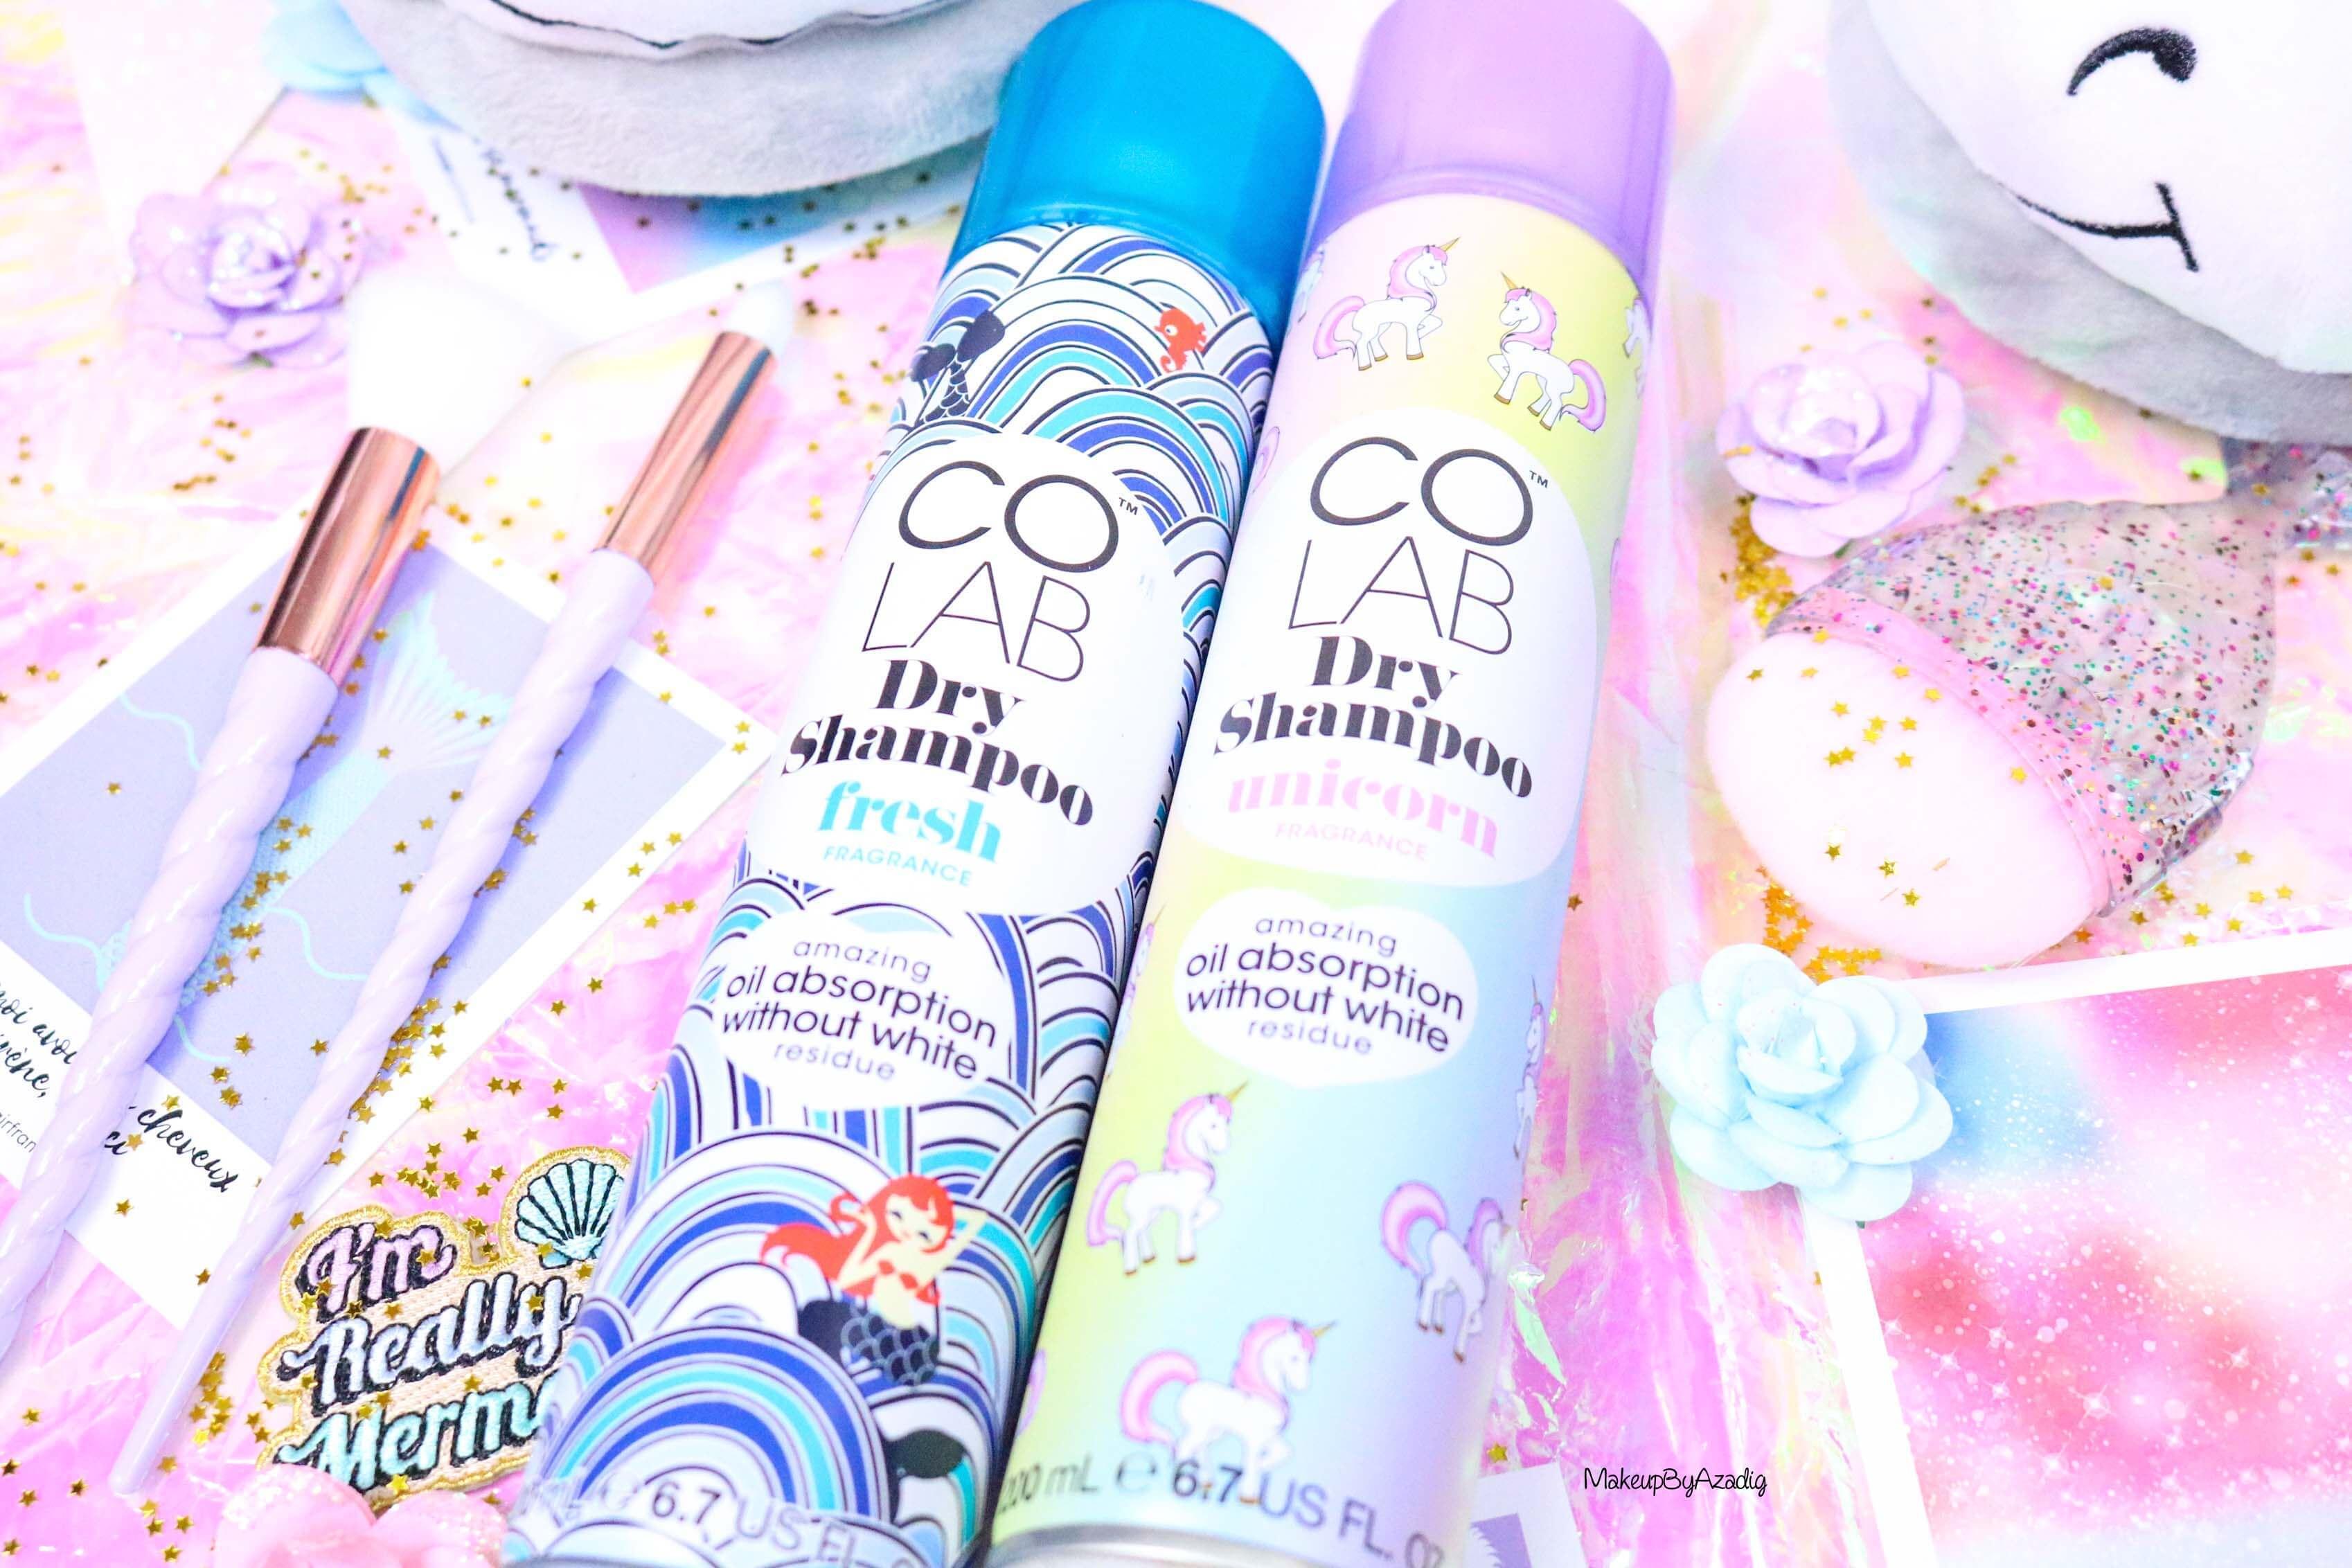 revue-shampooing-sec-colab-batiste-fresh-unicorn-monoprix-feelunique-prix-avis--soin-capillaire-efficacite-makeupbyazadig-licorne